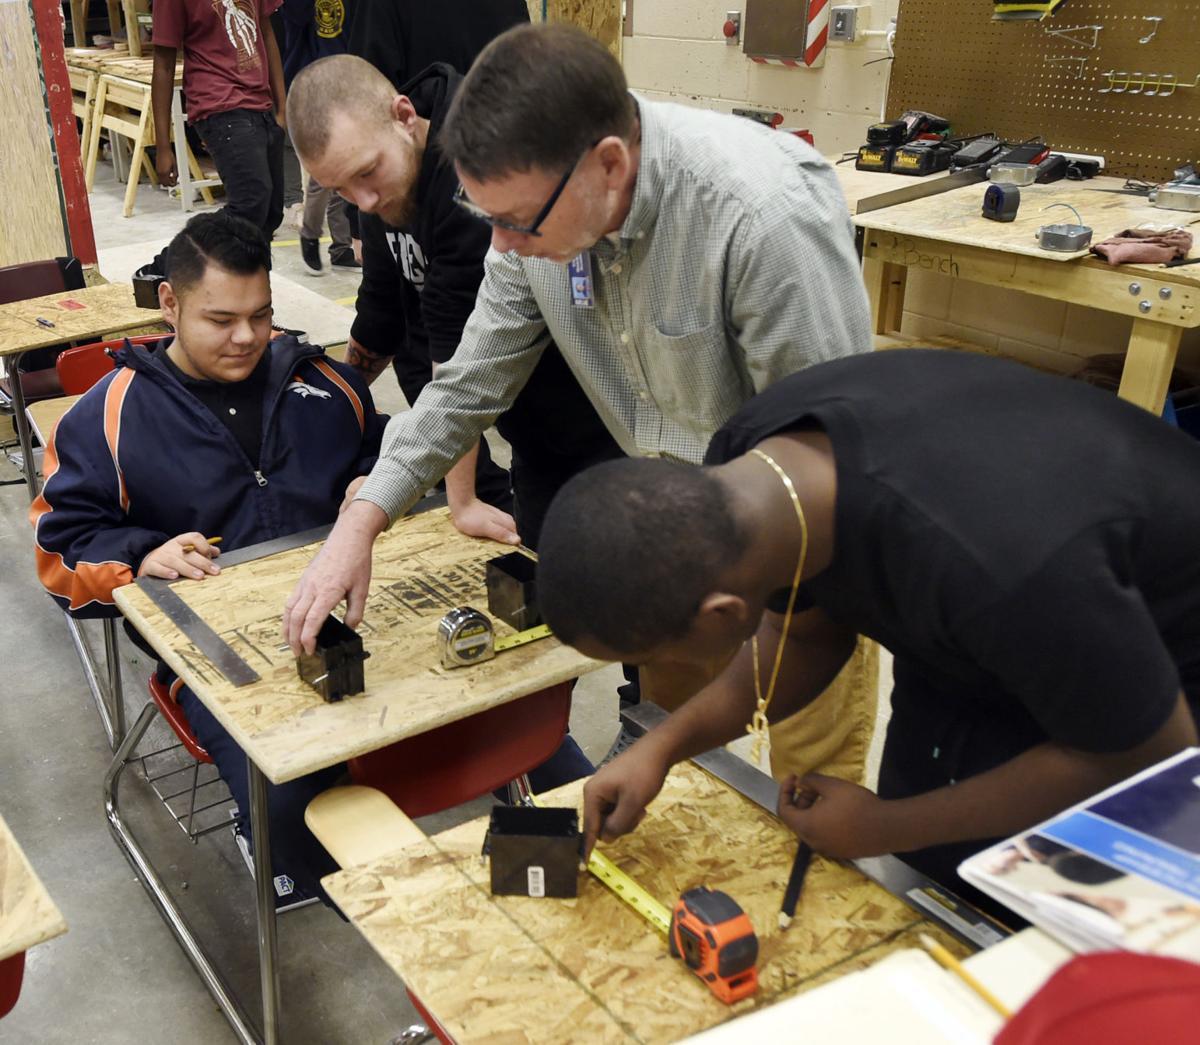 Colorado Springs programs target labor shortages, skills gaps